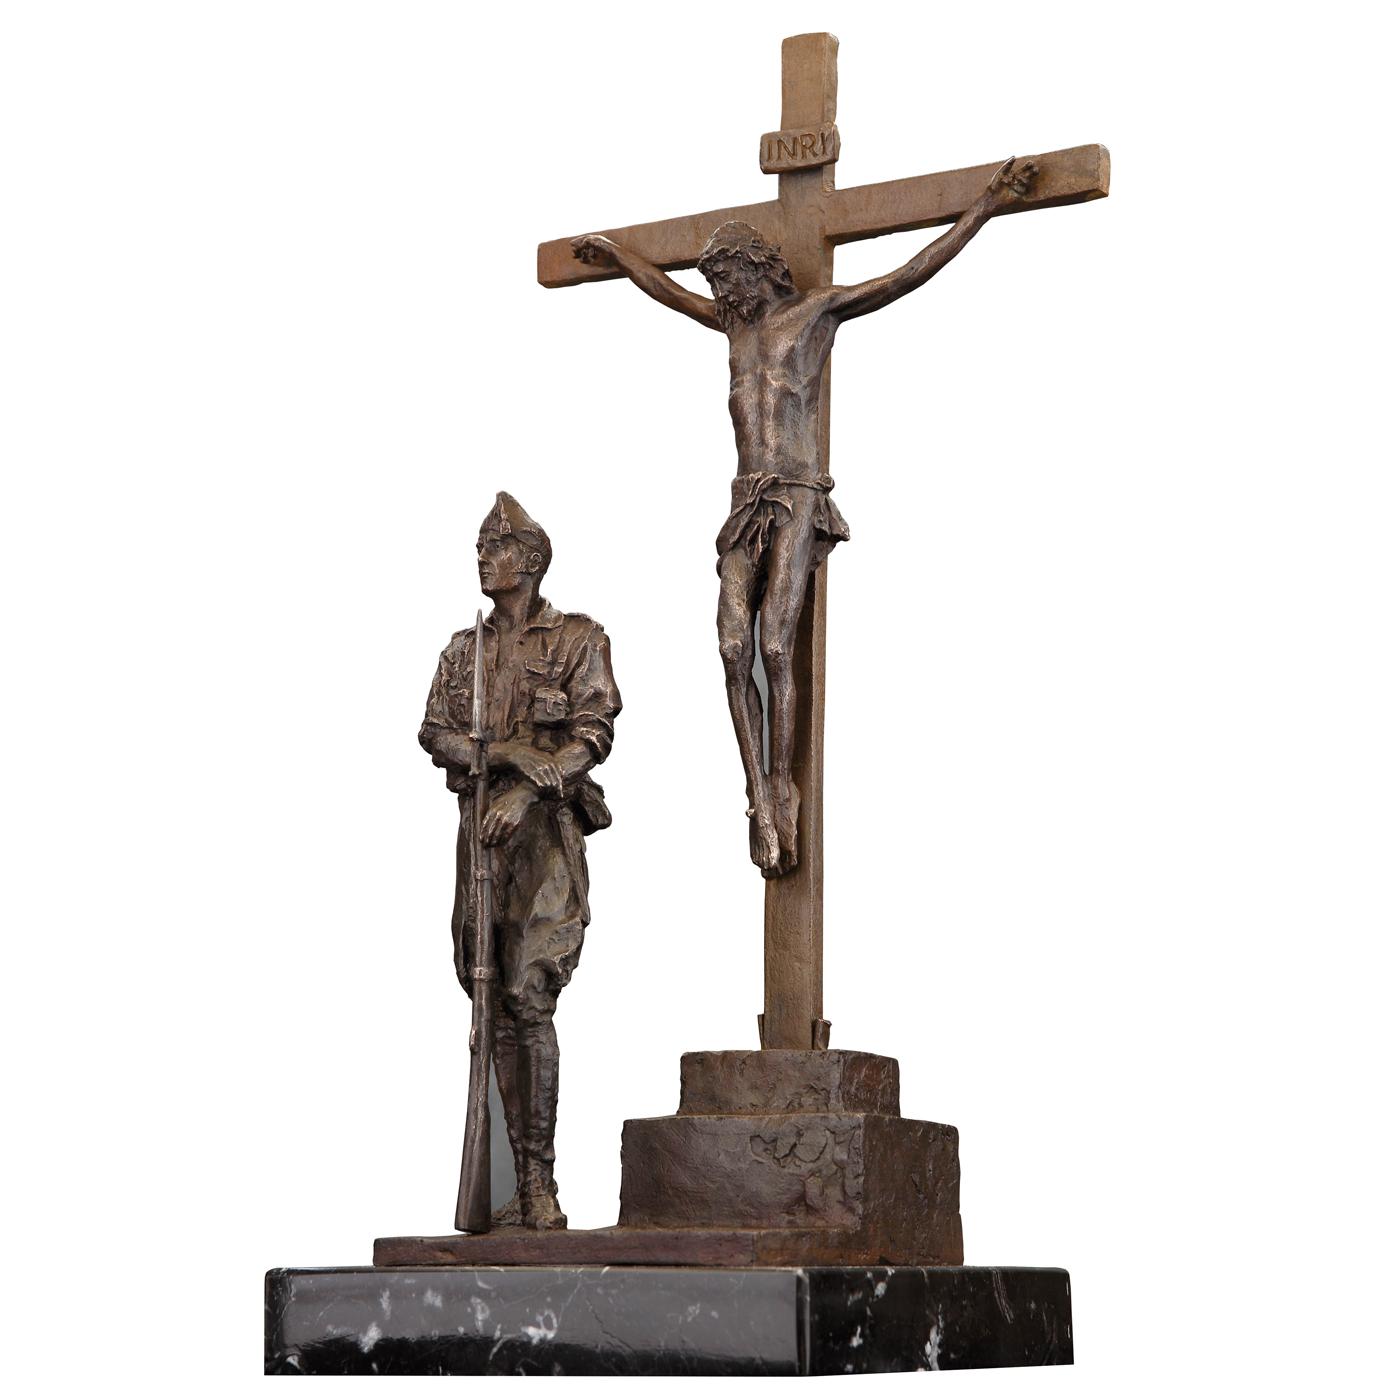 Legionario cristo de la buena suerte escultura historica madrid